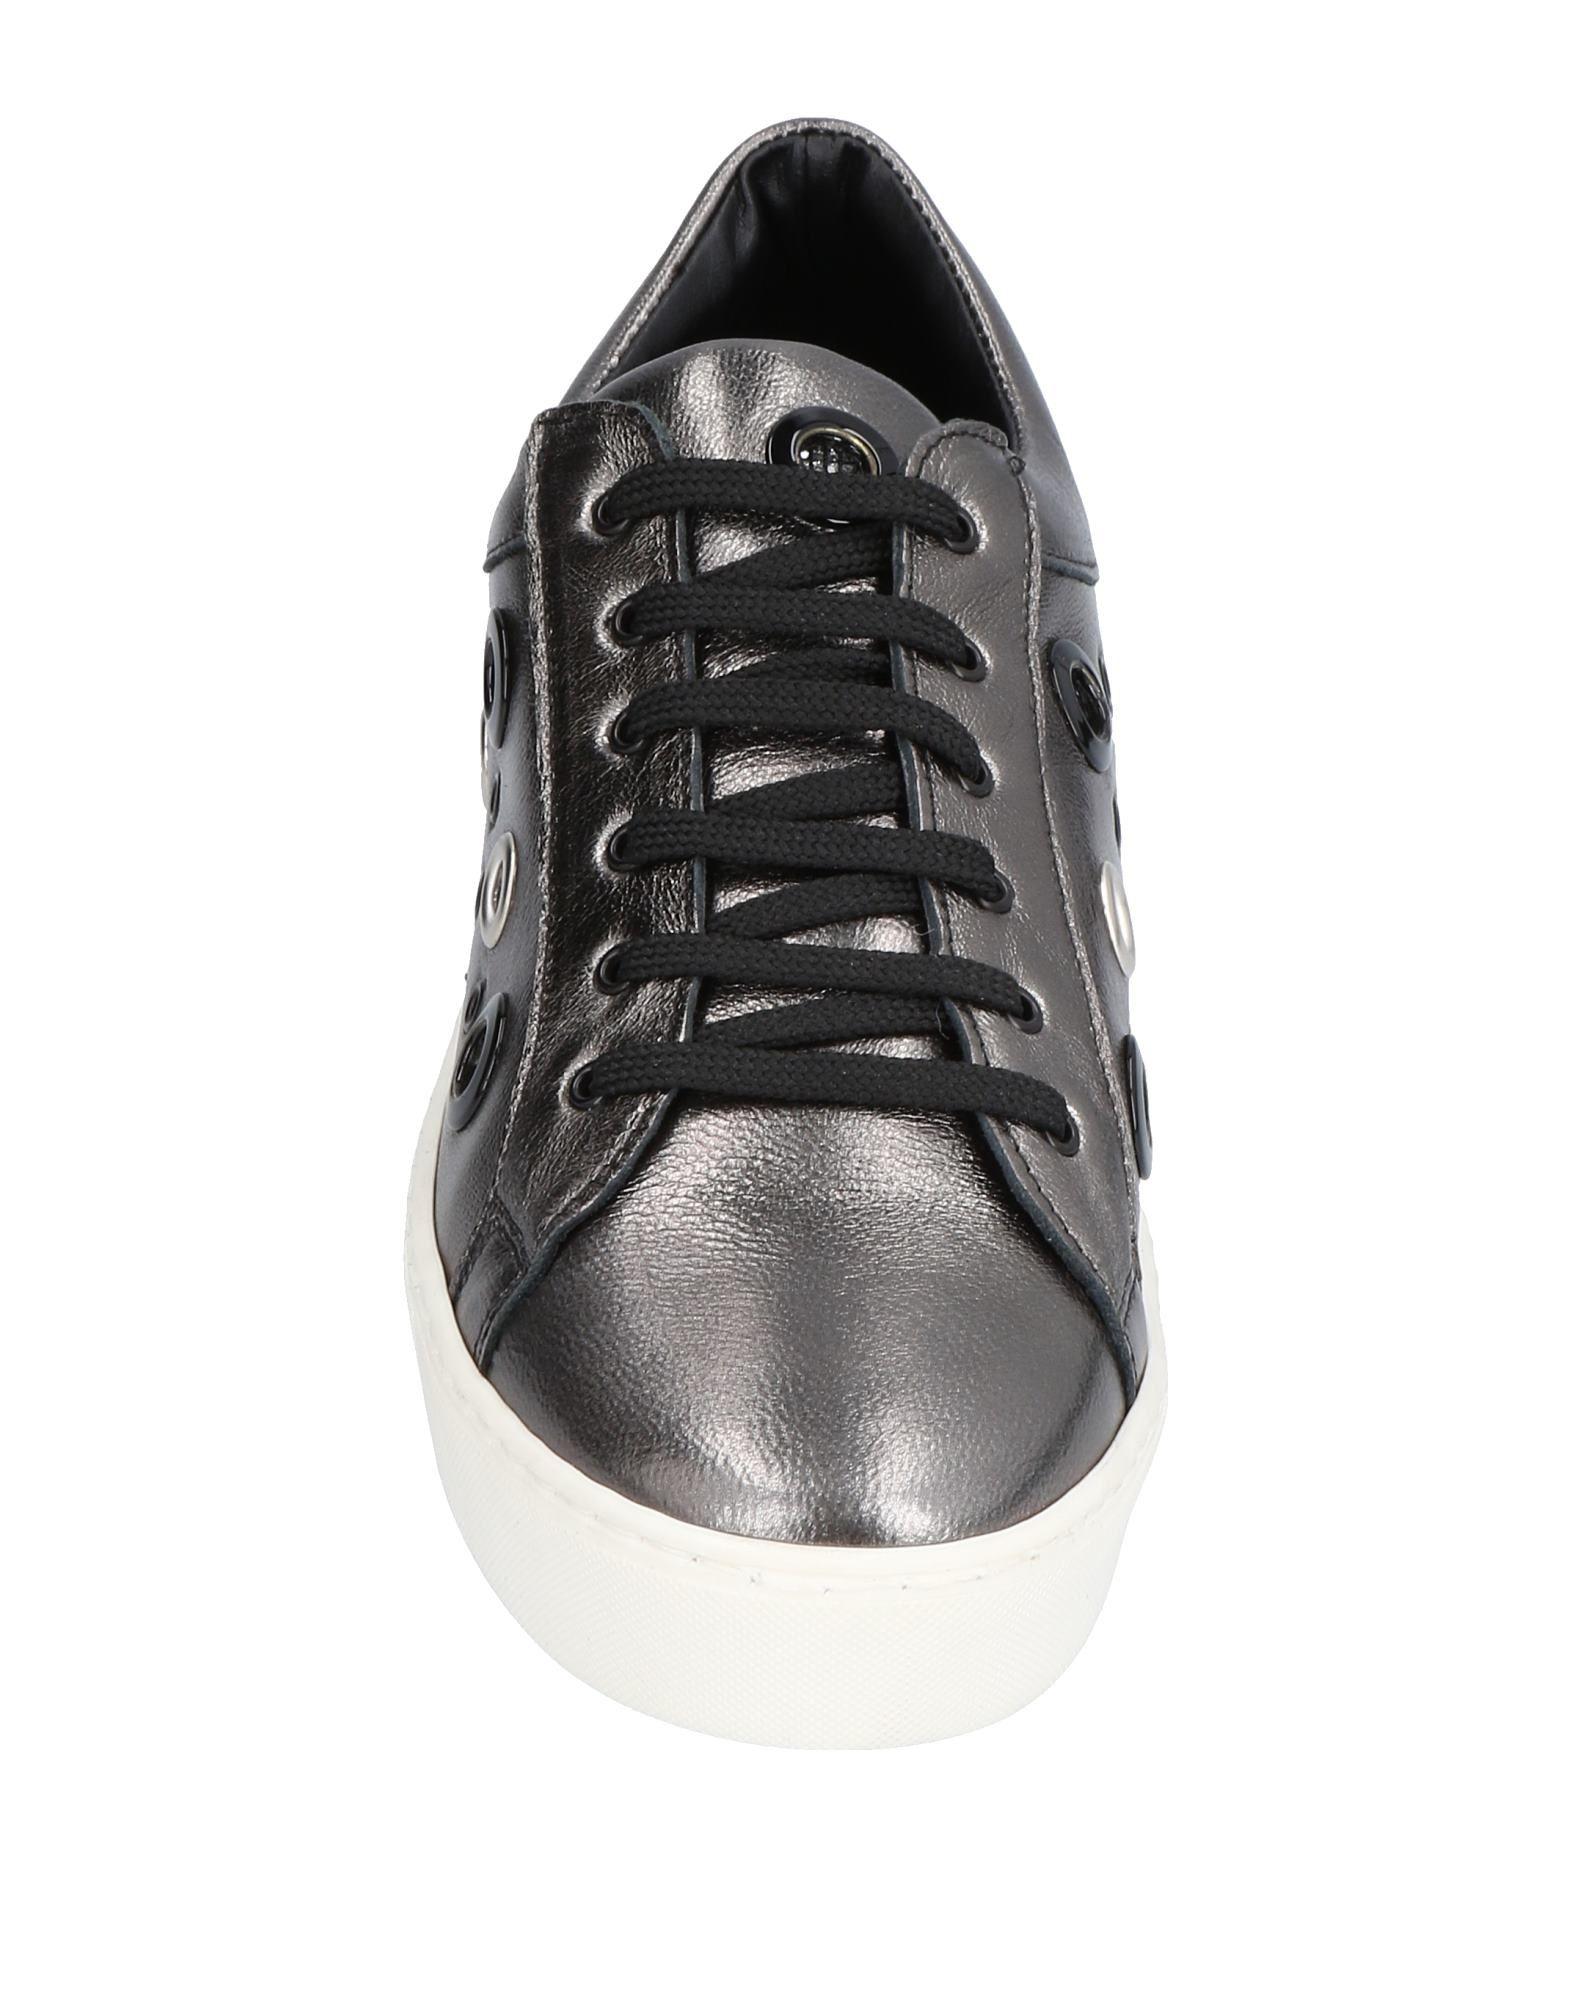 Nila & Nila Sneakers Damen es Gutes Preis-Leistungs-Verhältnis, es Damen lohnt sich d73db8